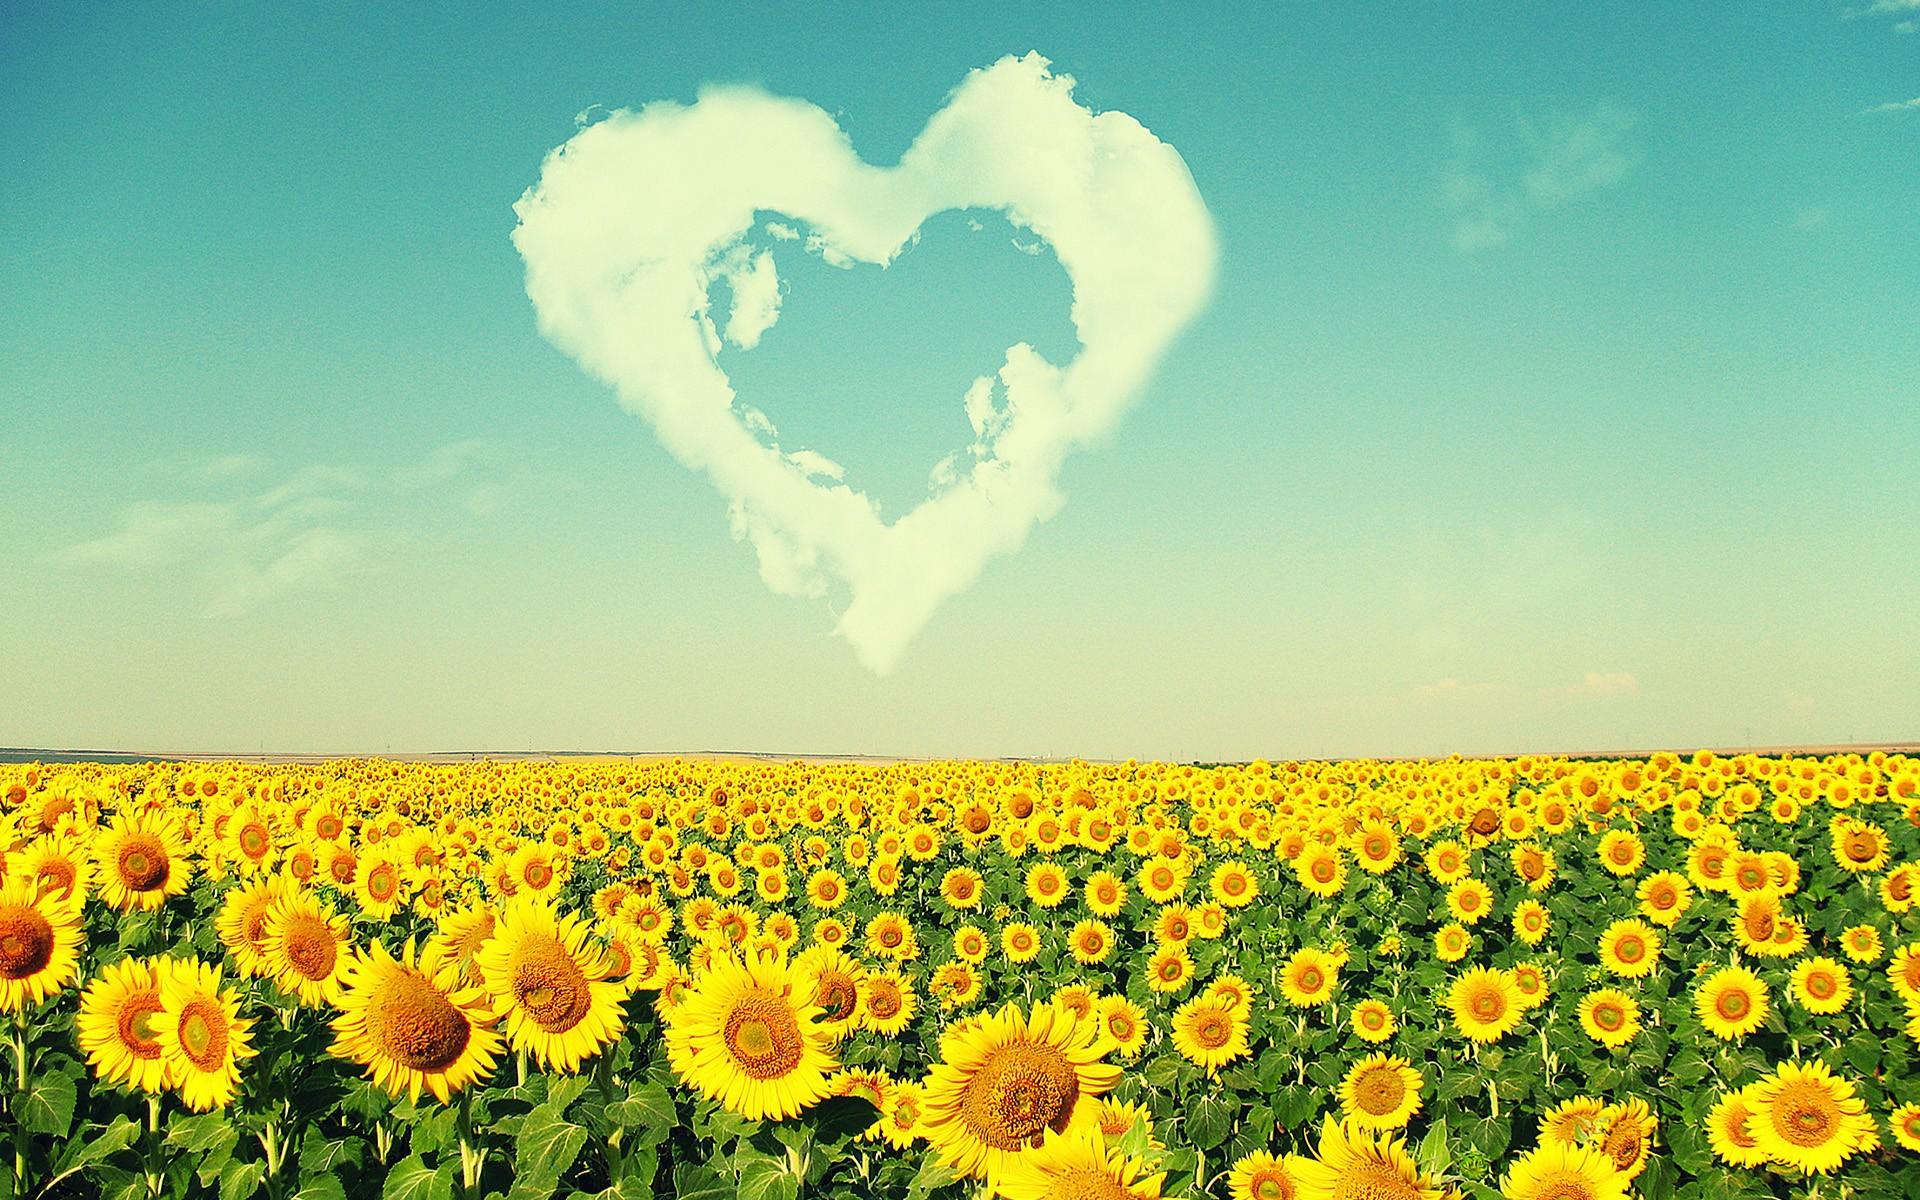 white sunflower background tumblr